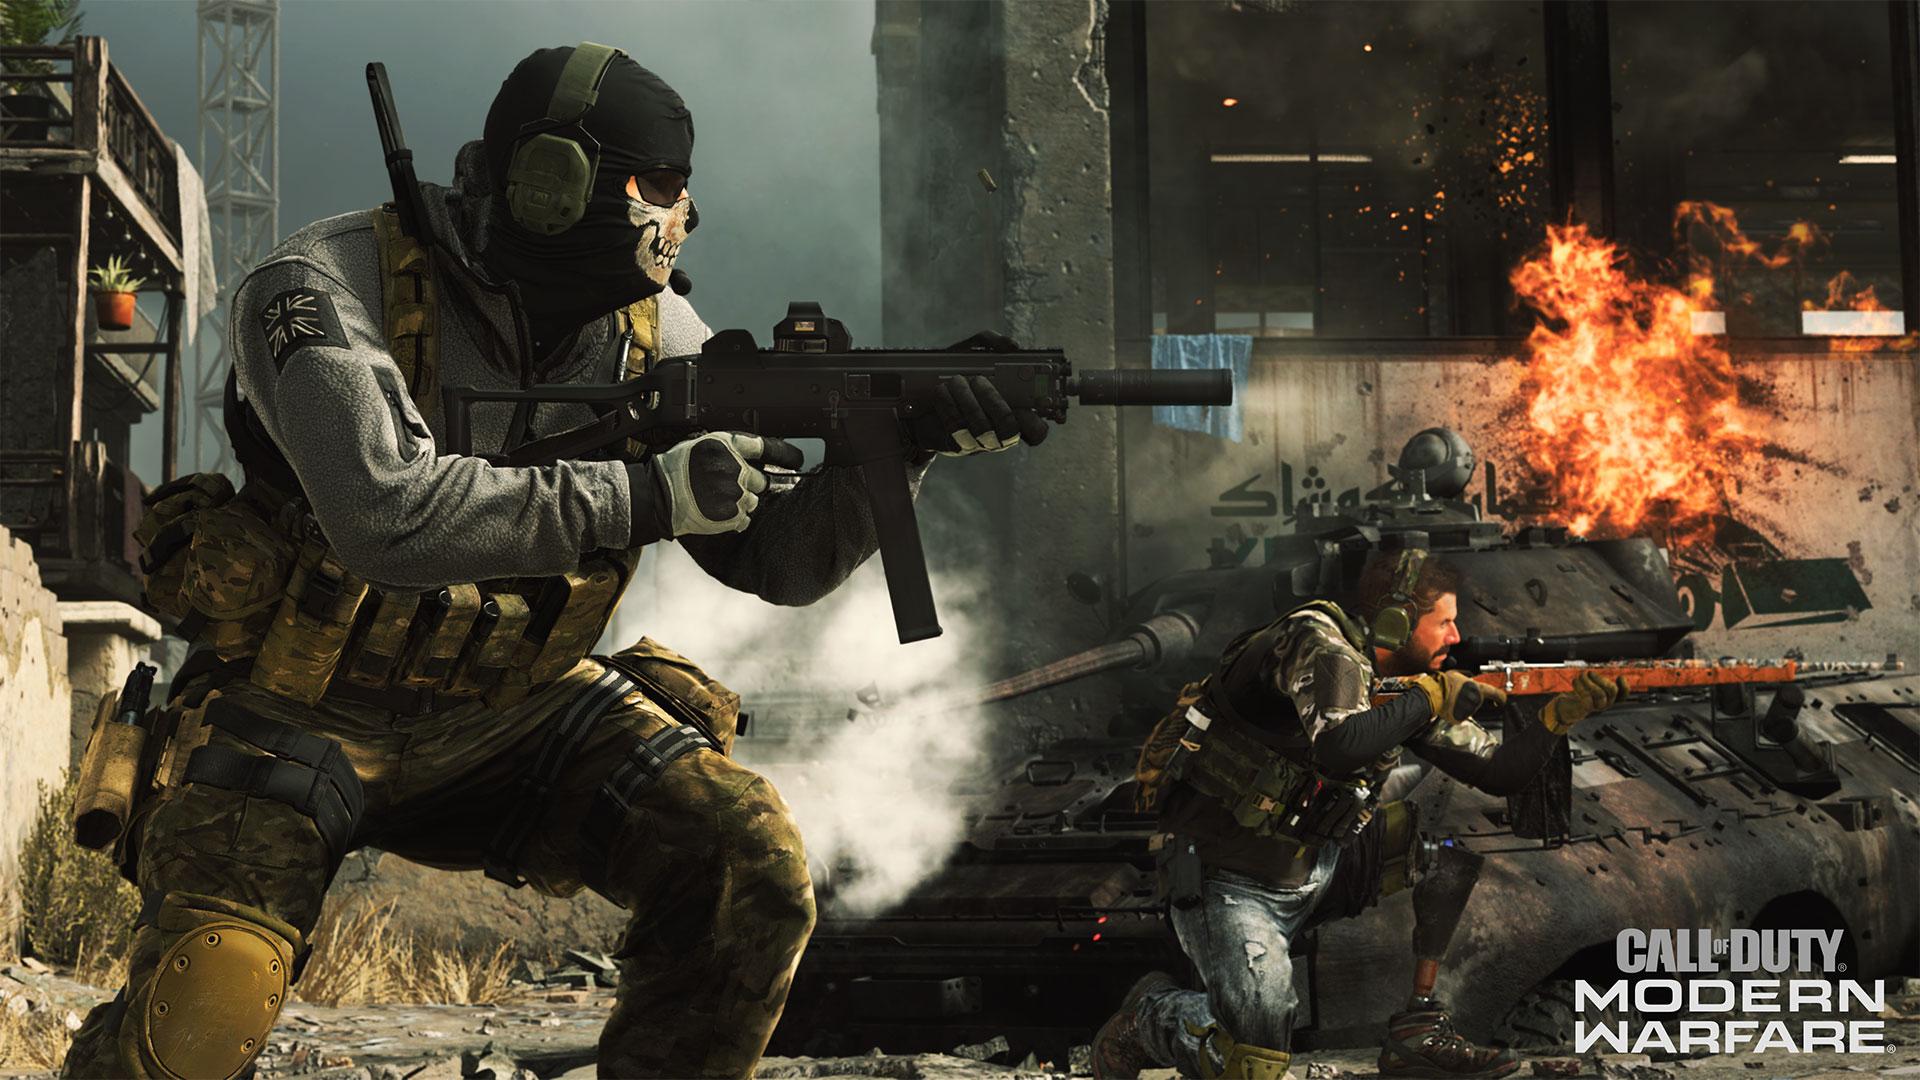 'Call of Duty: Modern Warfare' Season 3 Is Now Live